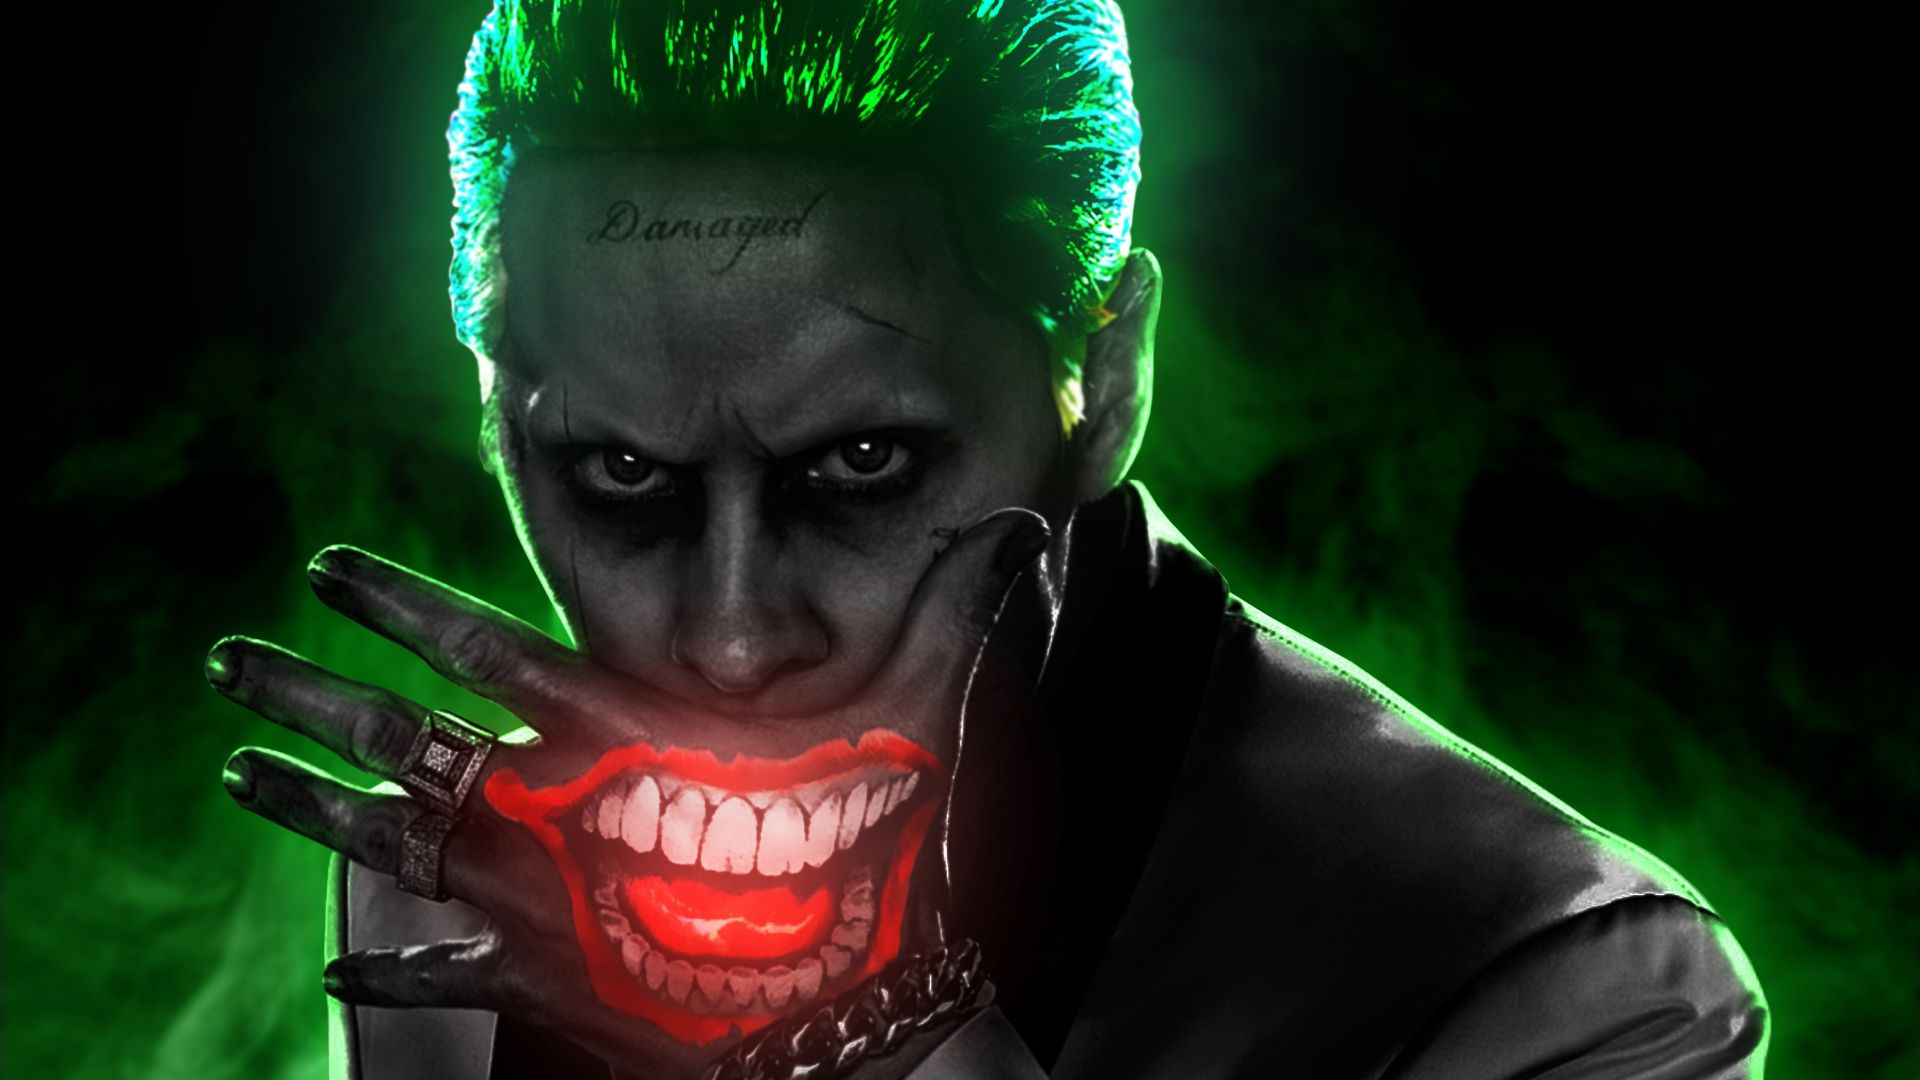 Suicide Squad Joker, Good Wallpaper